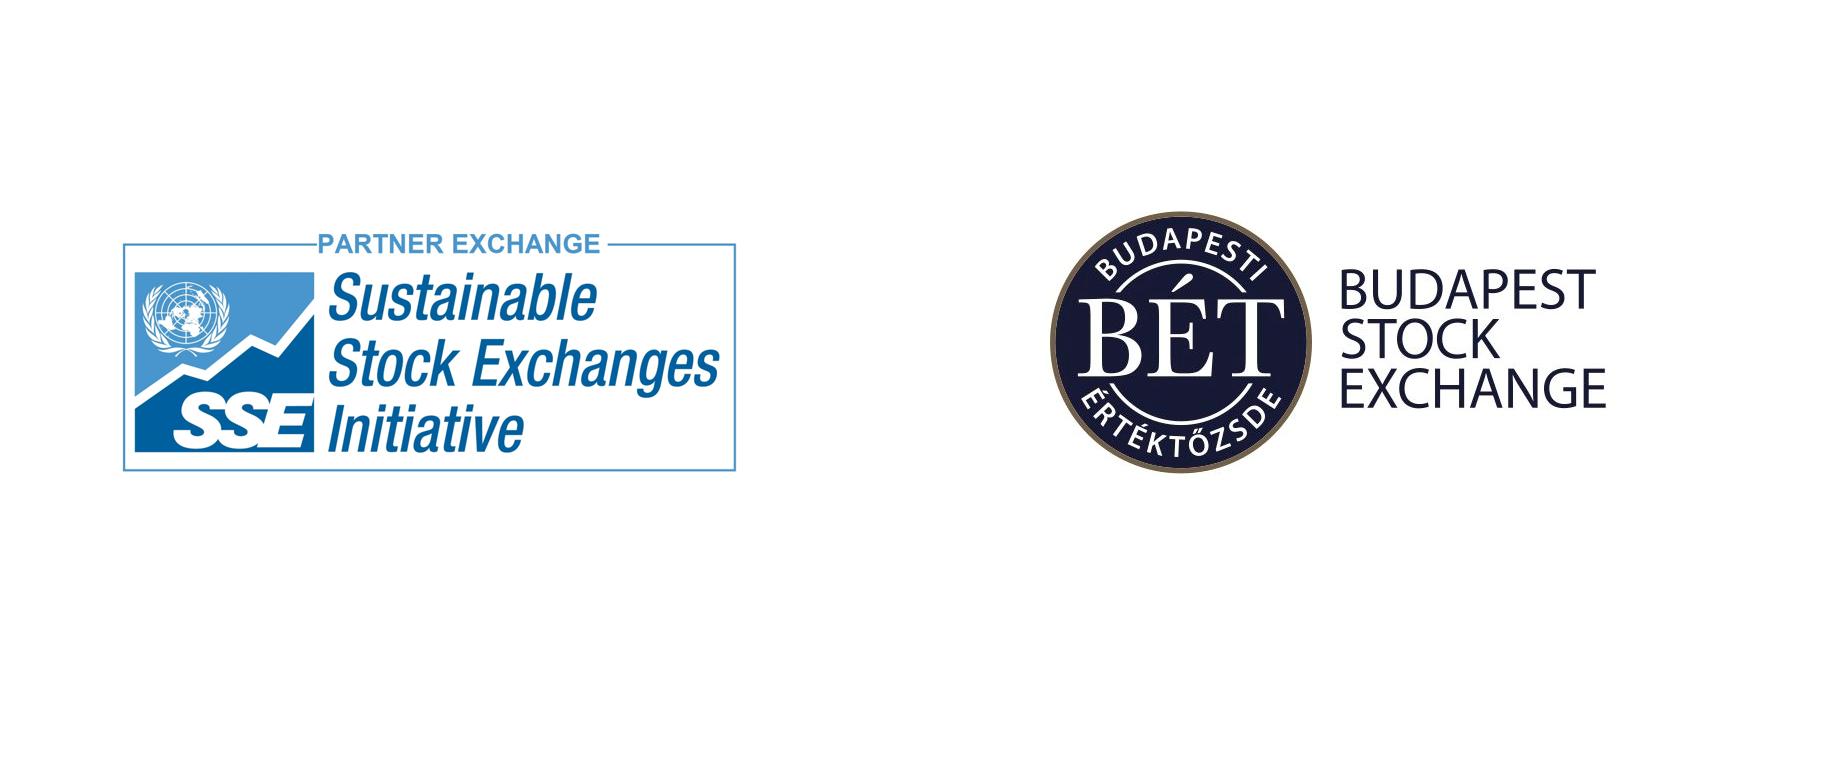 Budapest Stock Exchange becomes UN SSE Partner Exchange